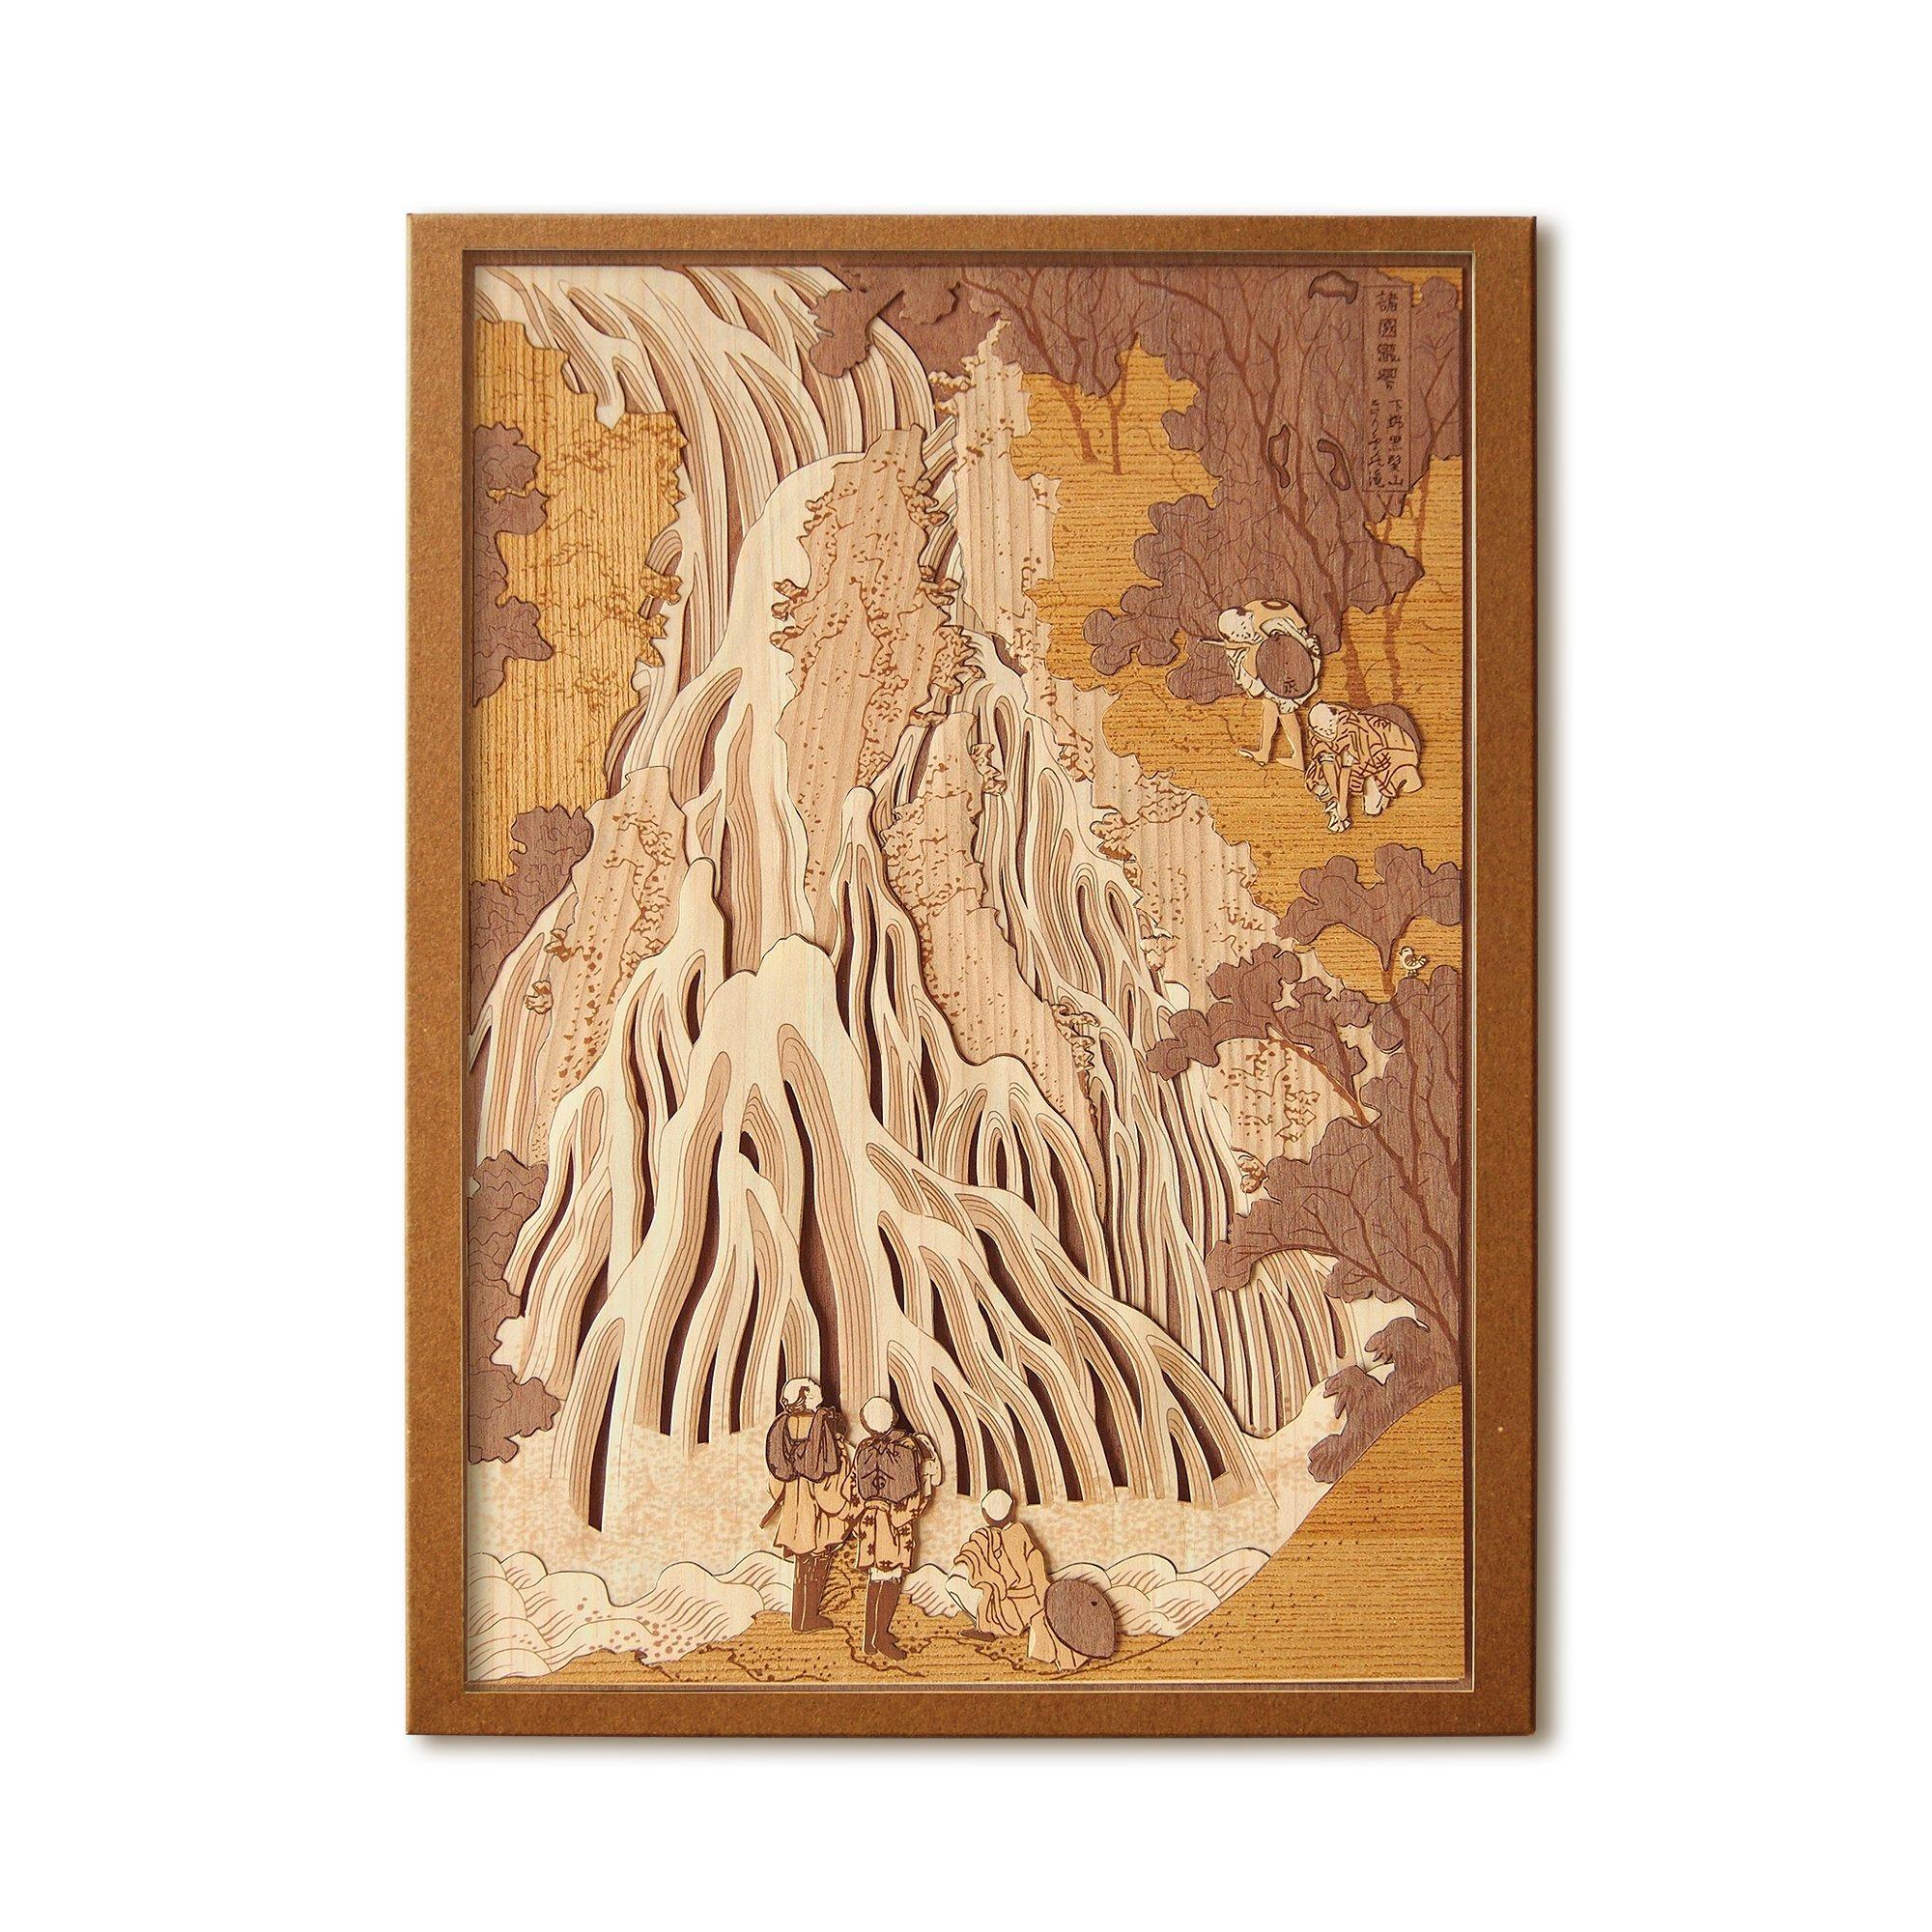 KINOWA Ukiyoe Art Kit Kiharie Kirifuri Waterfall at Mt. Kurokami in Shimotsuke Made in Japan by KINOWA (Image #1)